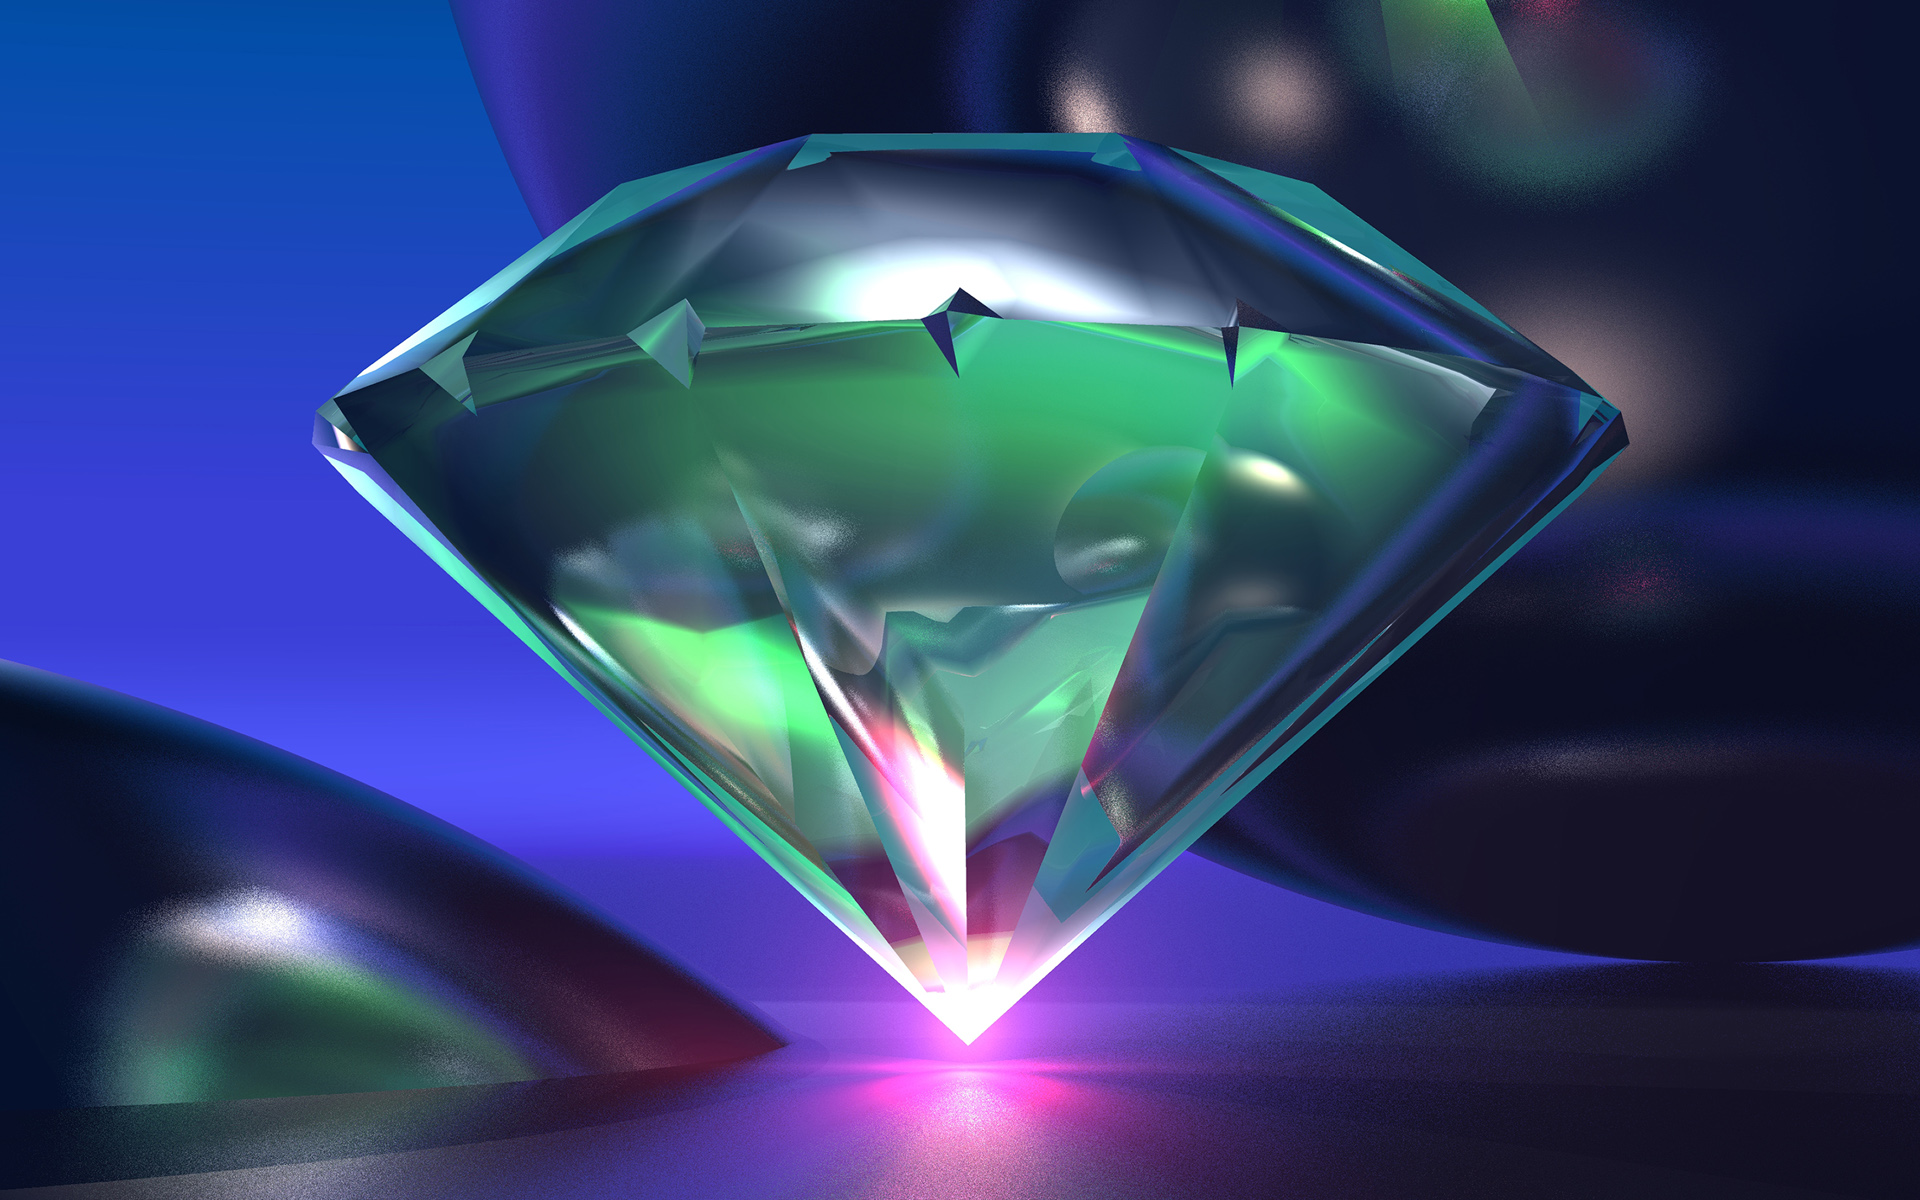 Diamond wallpaper   815728 1920x1200